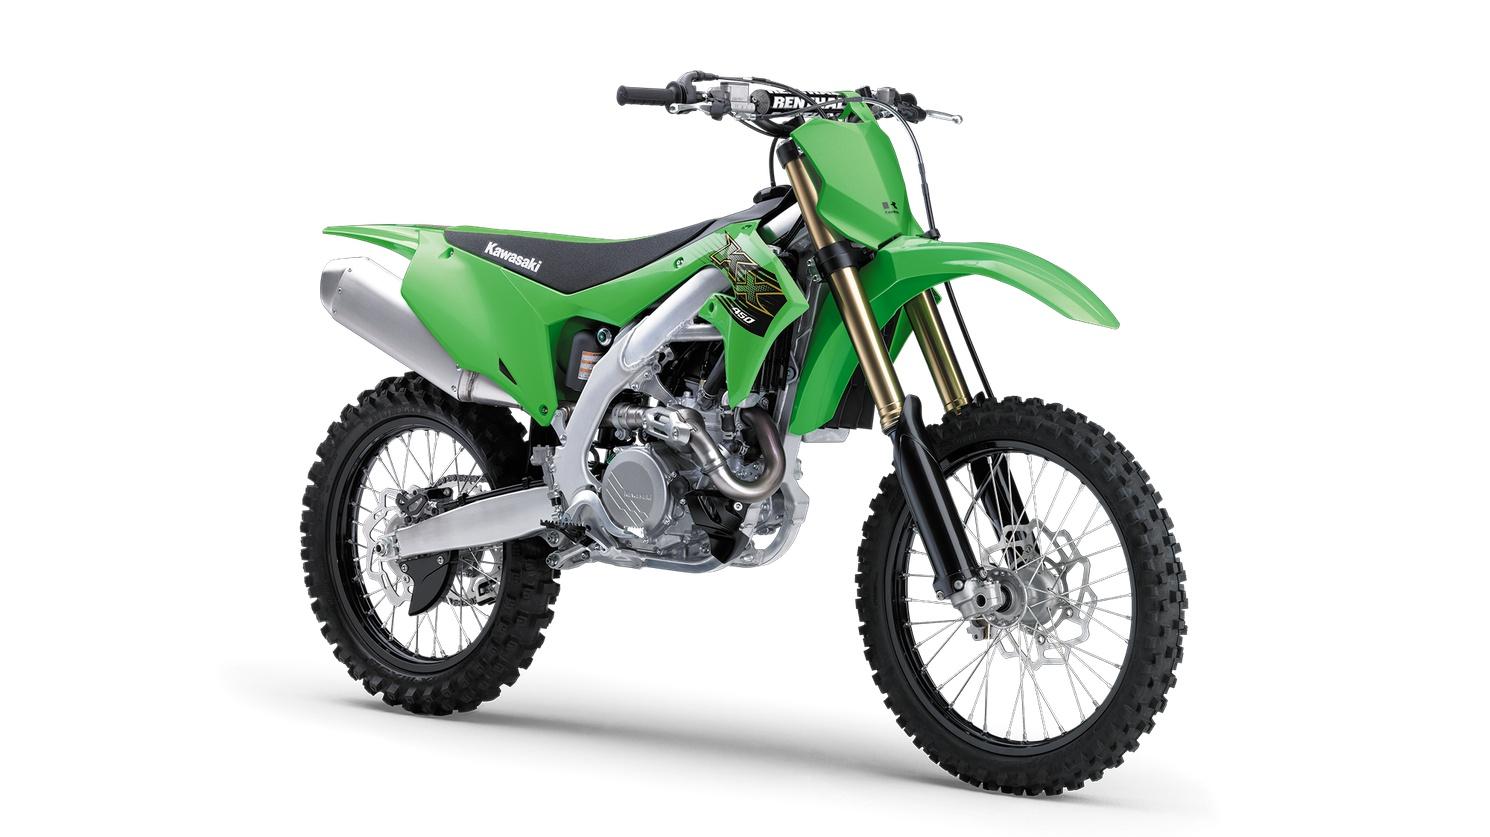 2020 Kawasaki KX450 Lime Green